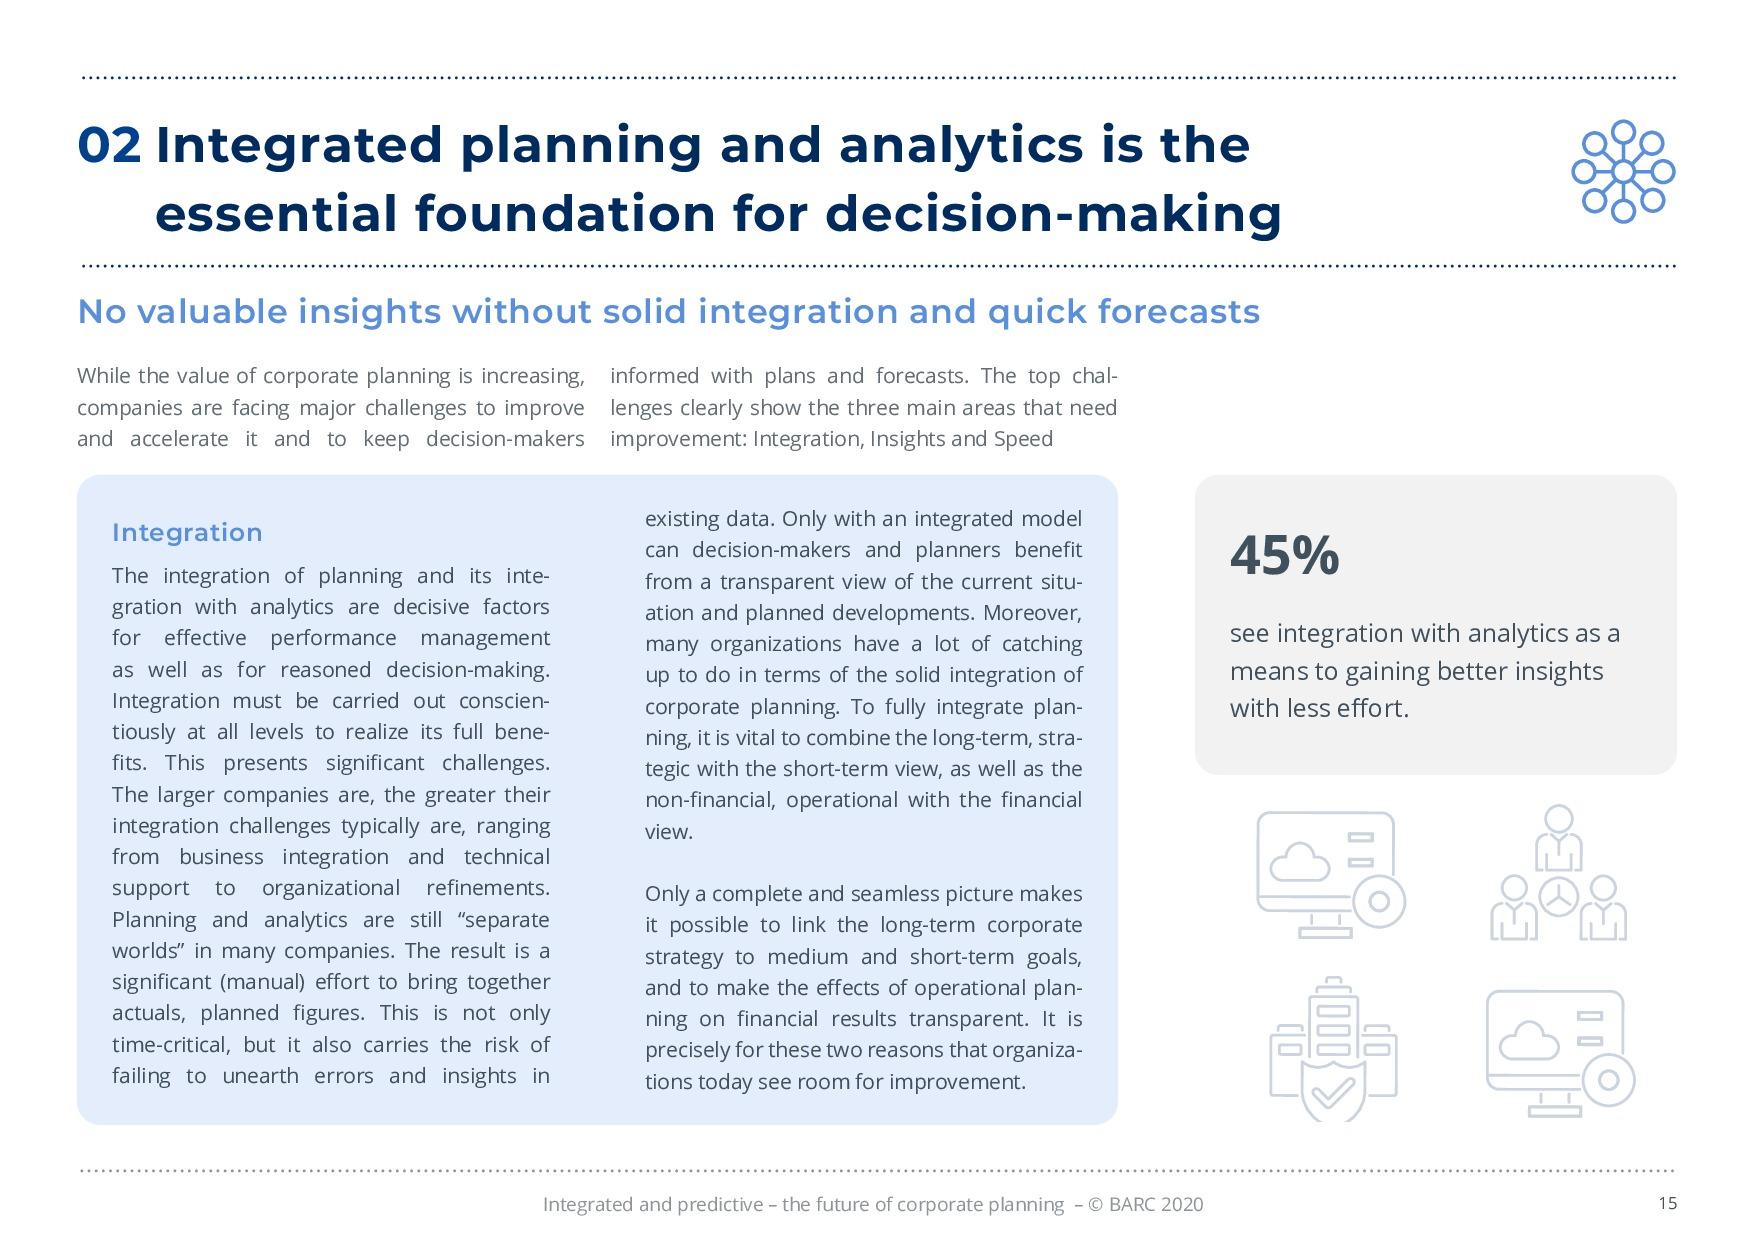 BARC – 統合と予測 – 経営計画の未来 | Page 15